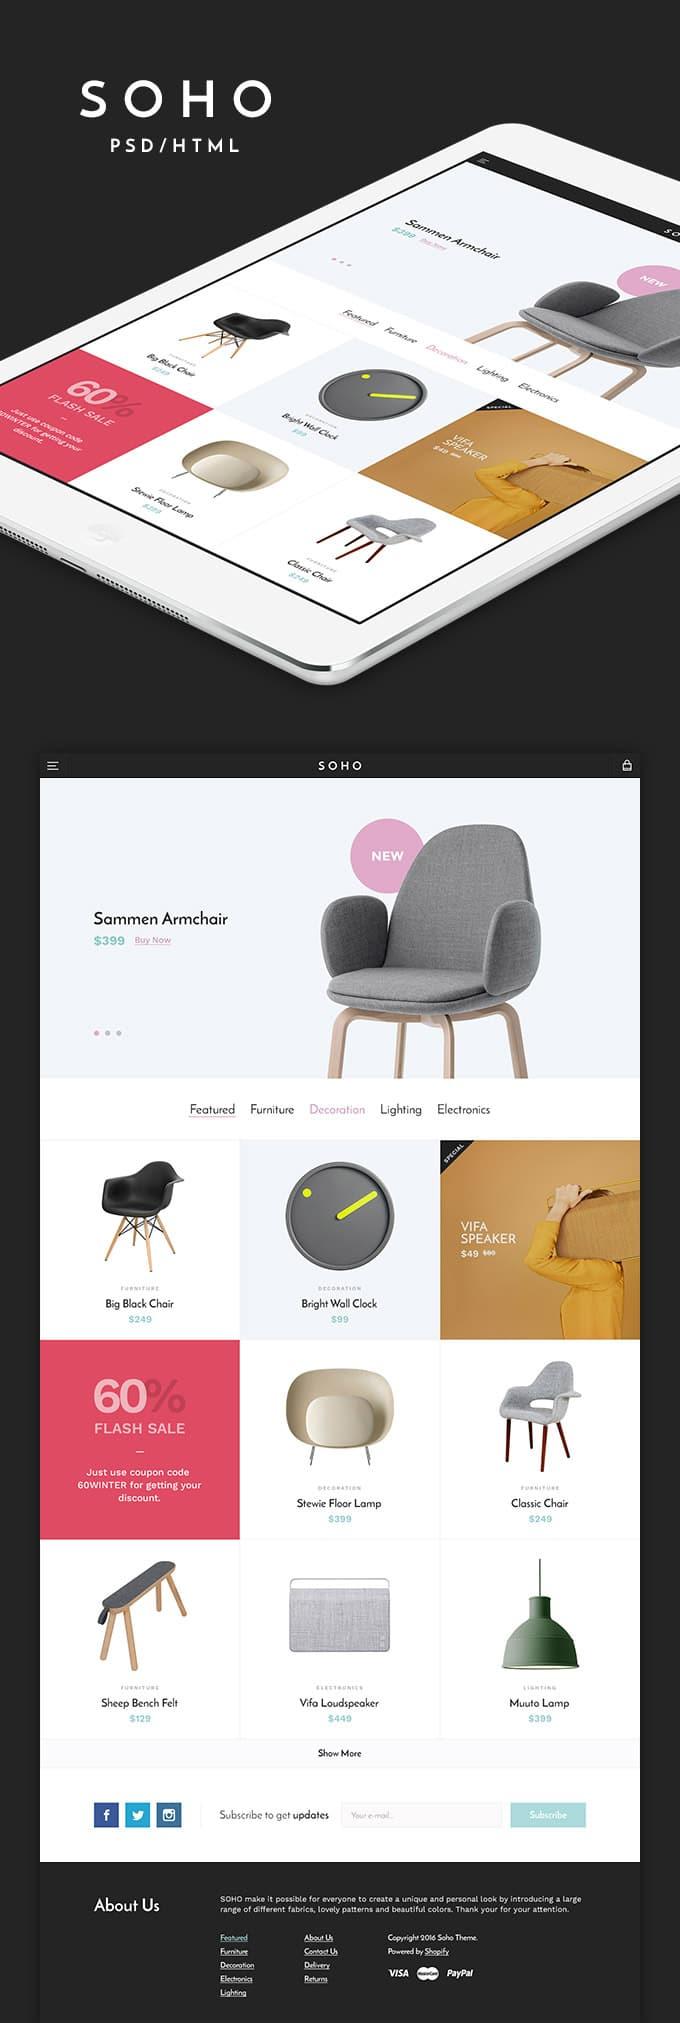 Soho - Free Responsive E commerce Template Бесплатные шаблоны для интернет-магазина psd - Soho - Бесплатные шаблоны для интернет-магазина PSD